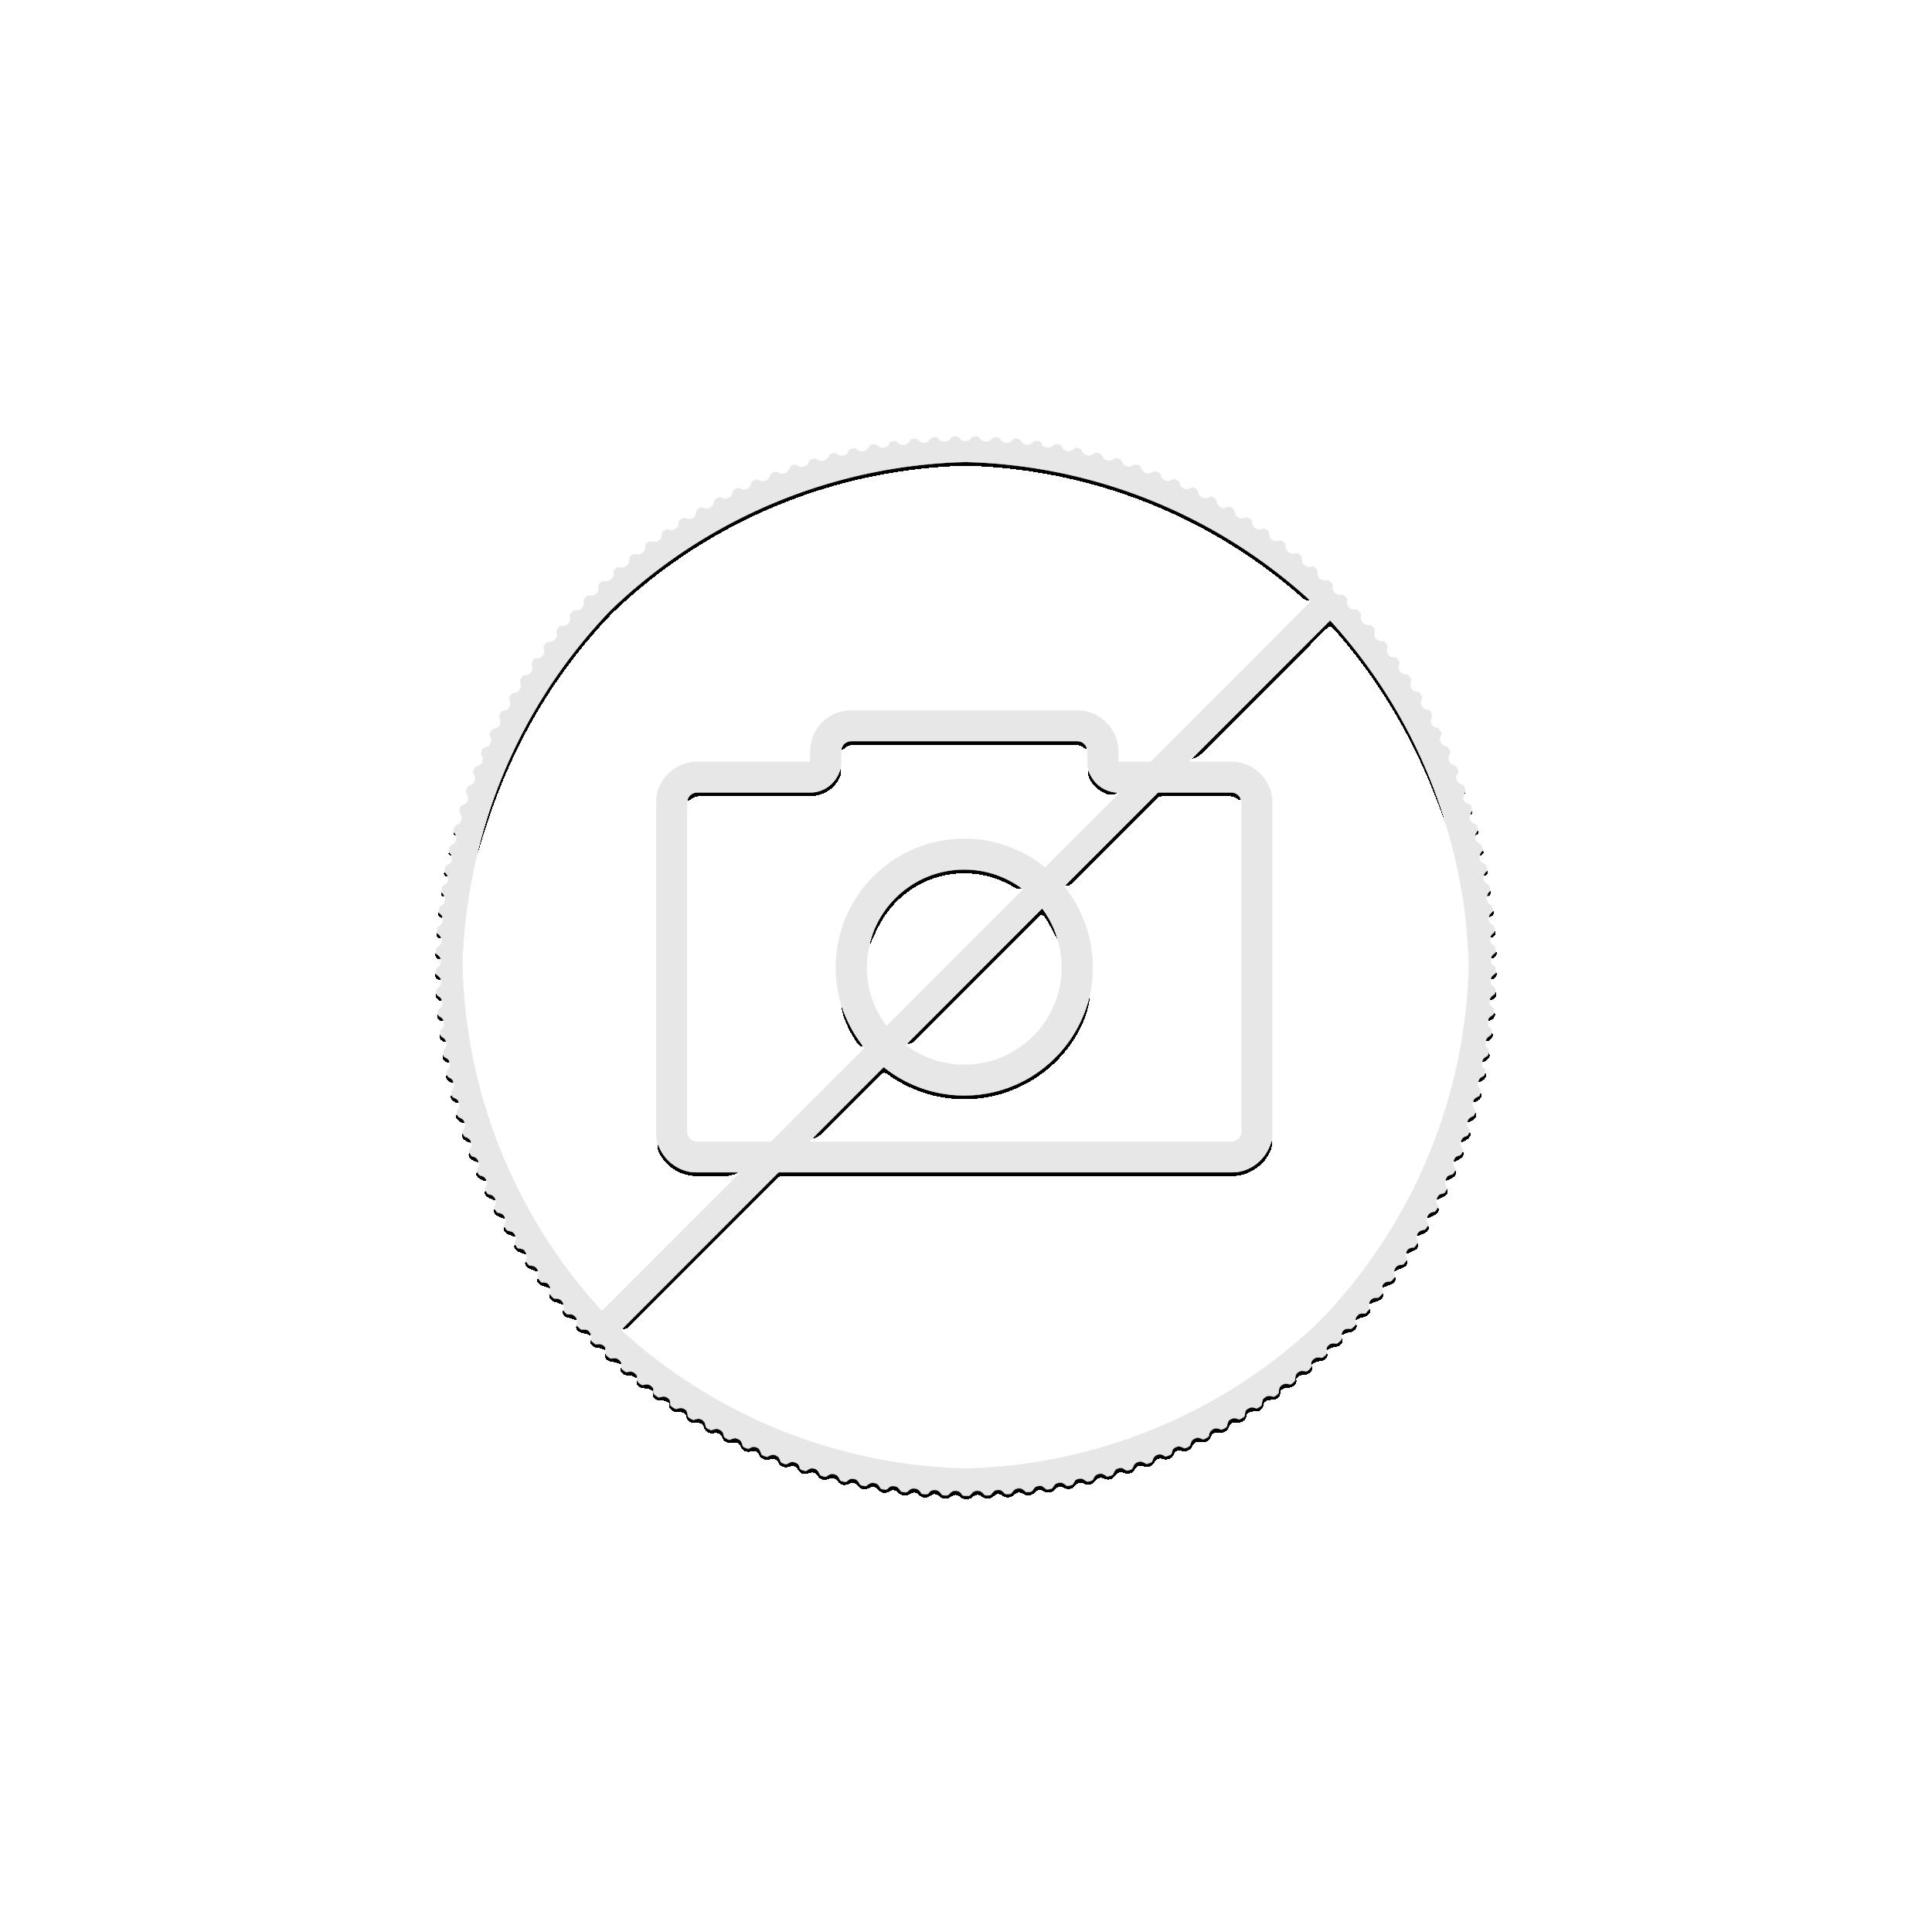 Gouden 1/10 troy ounce American Eagle munt 2019